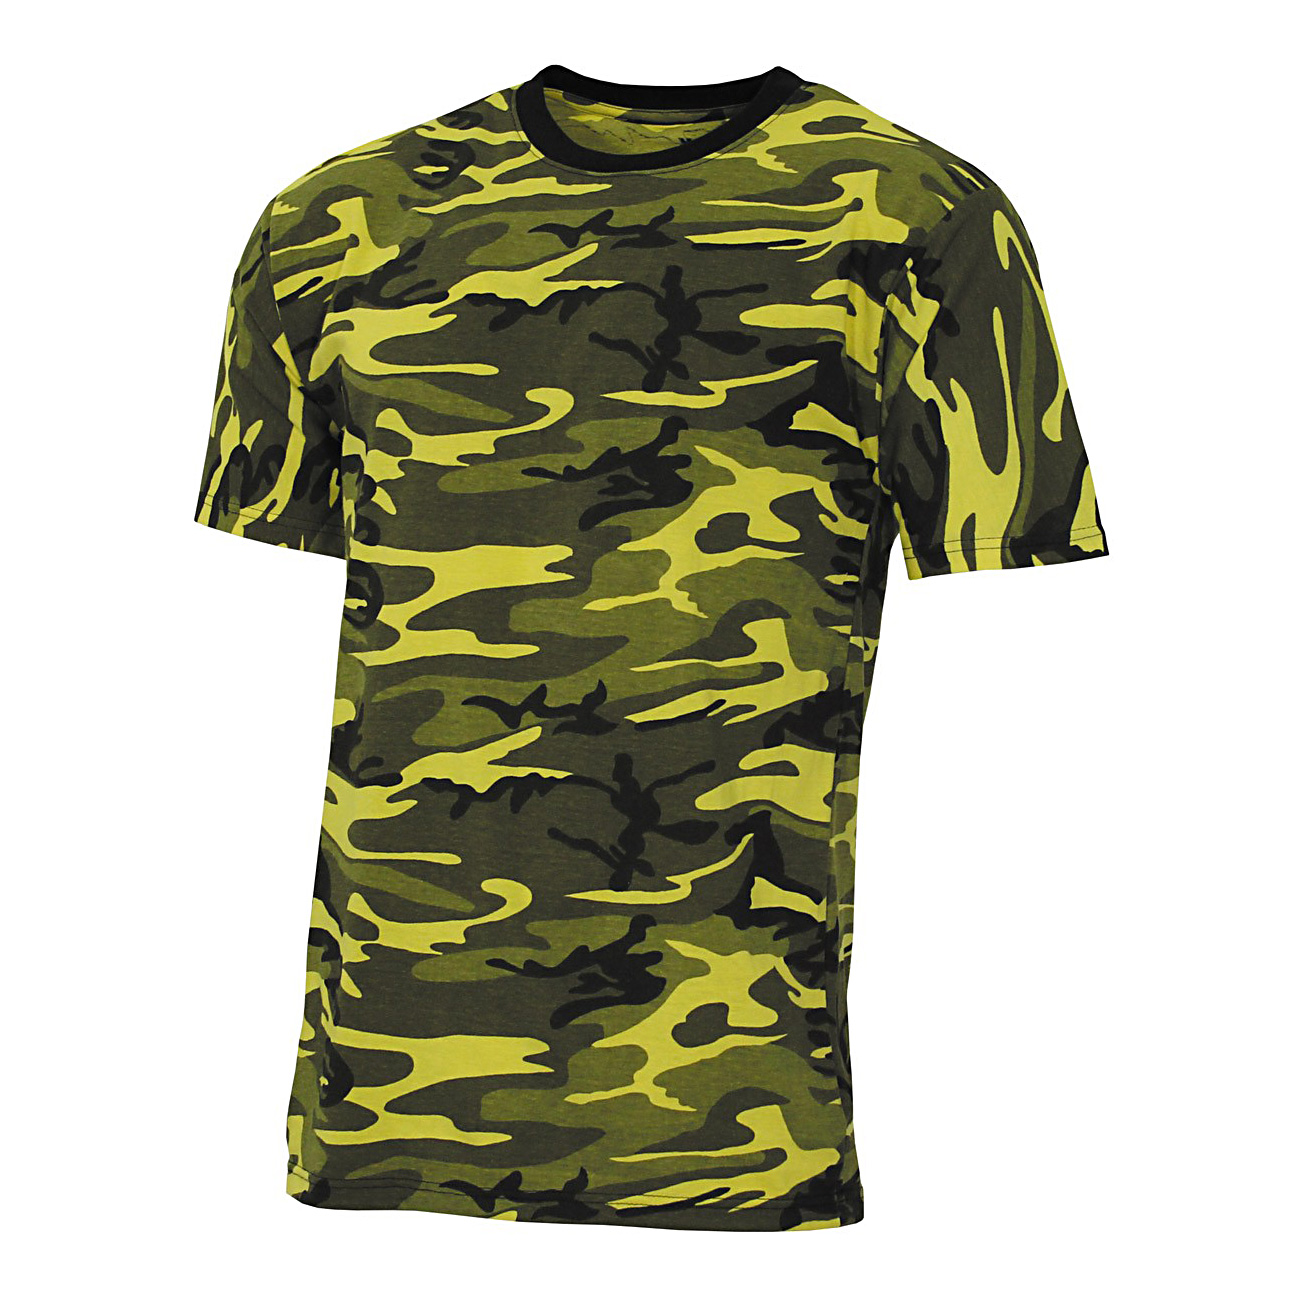 2bf4e6b357baba MFH US T-Shirt Streetstyle gelb-camo günstig kaufen - Kotte & Zeller